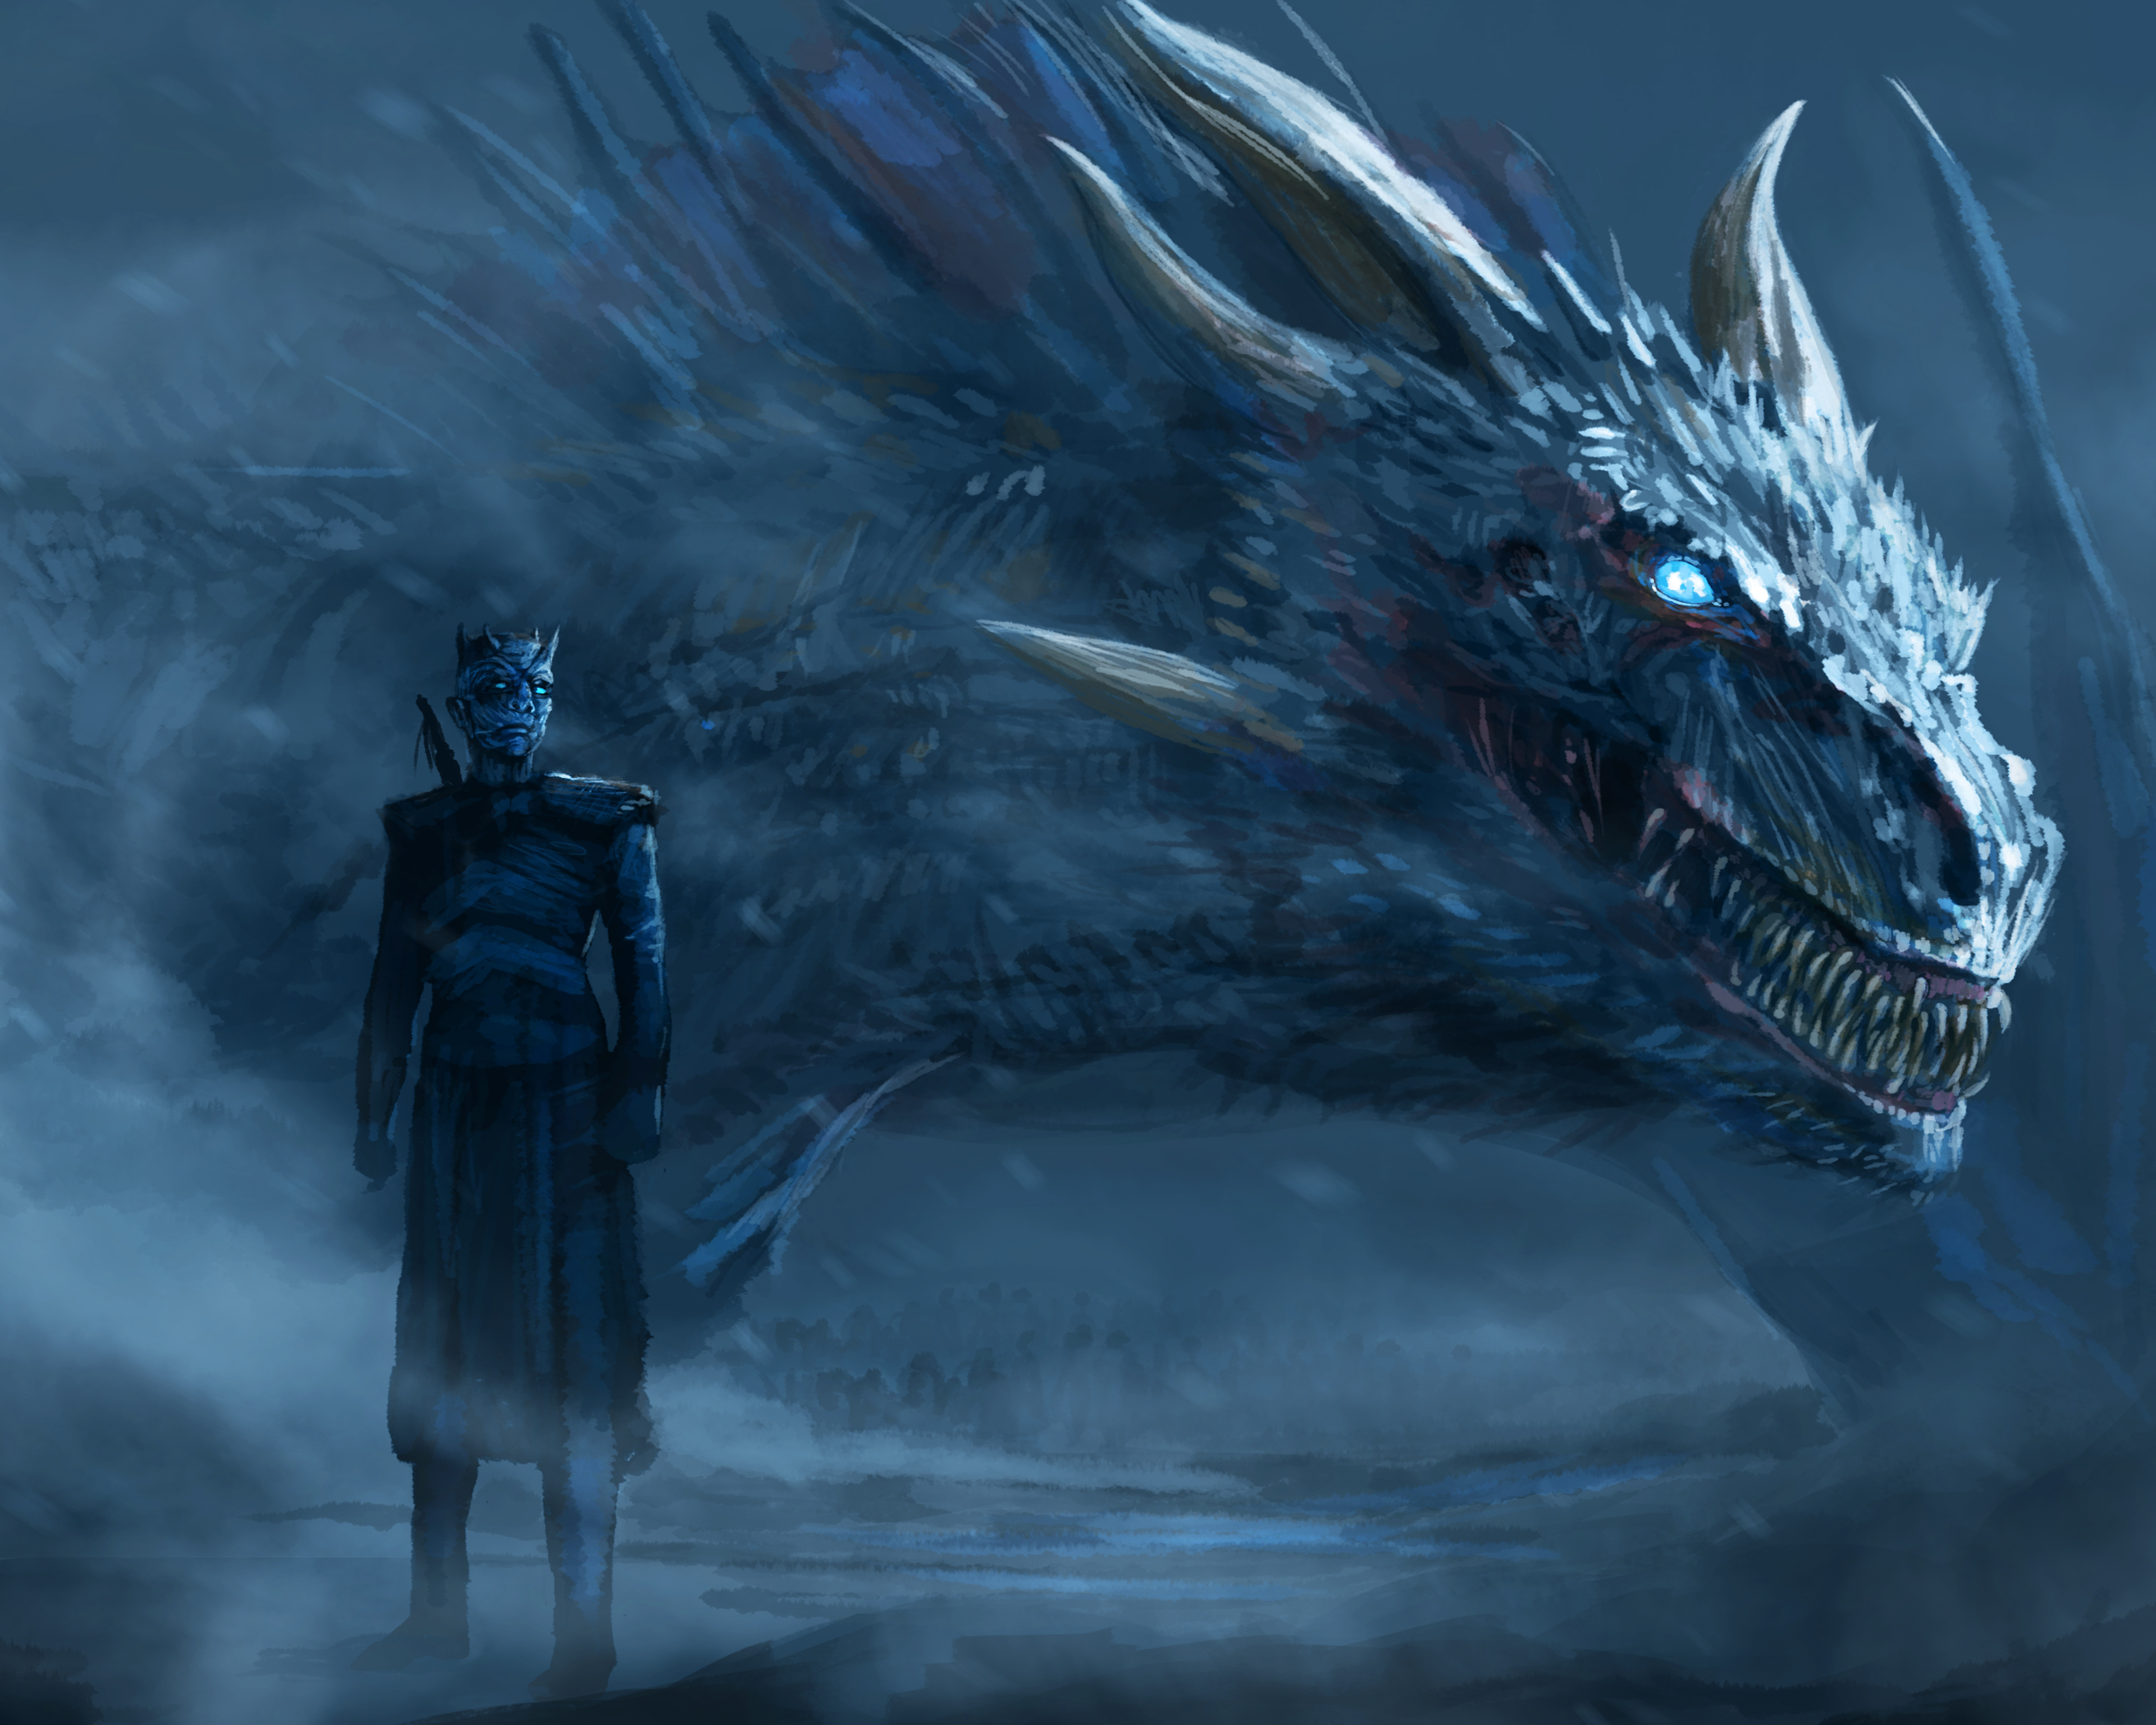 2048x1152 Night King Blue Eyes White Dragon 2048x1152 Resolution Hd